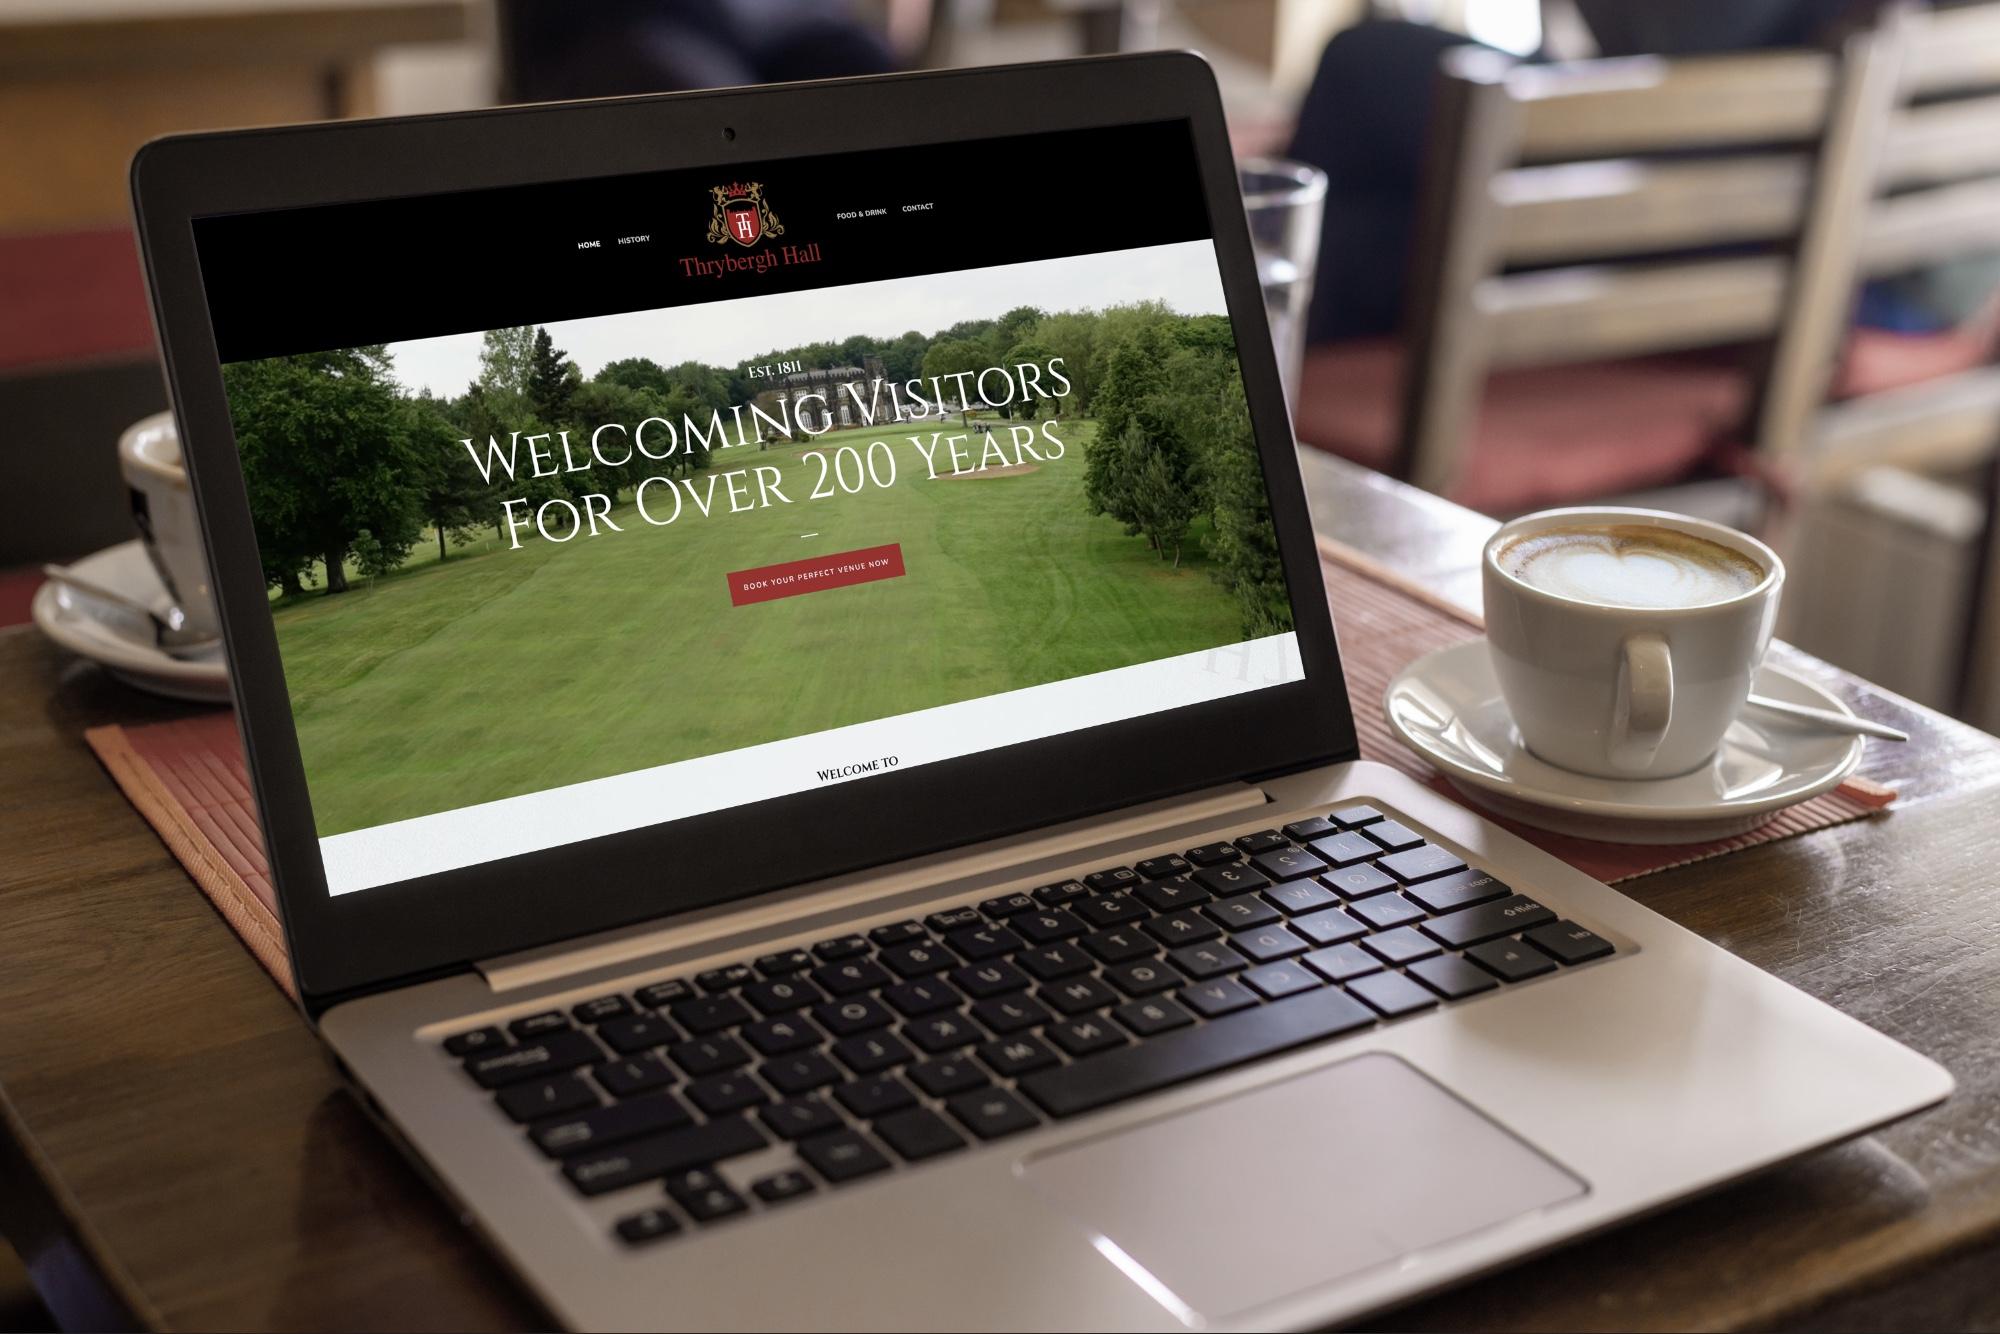 thrybergh hall website